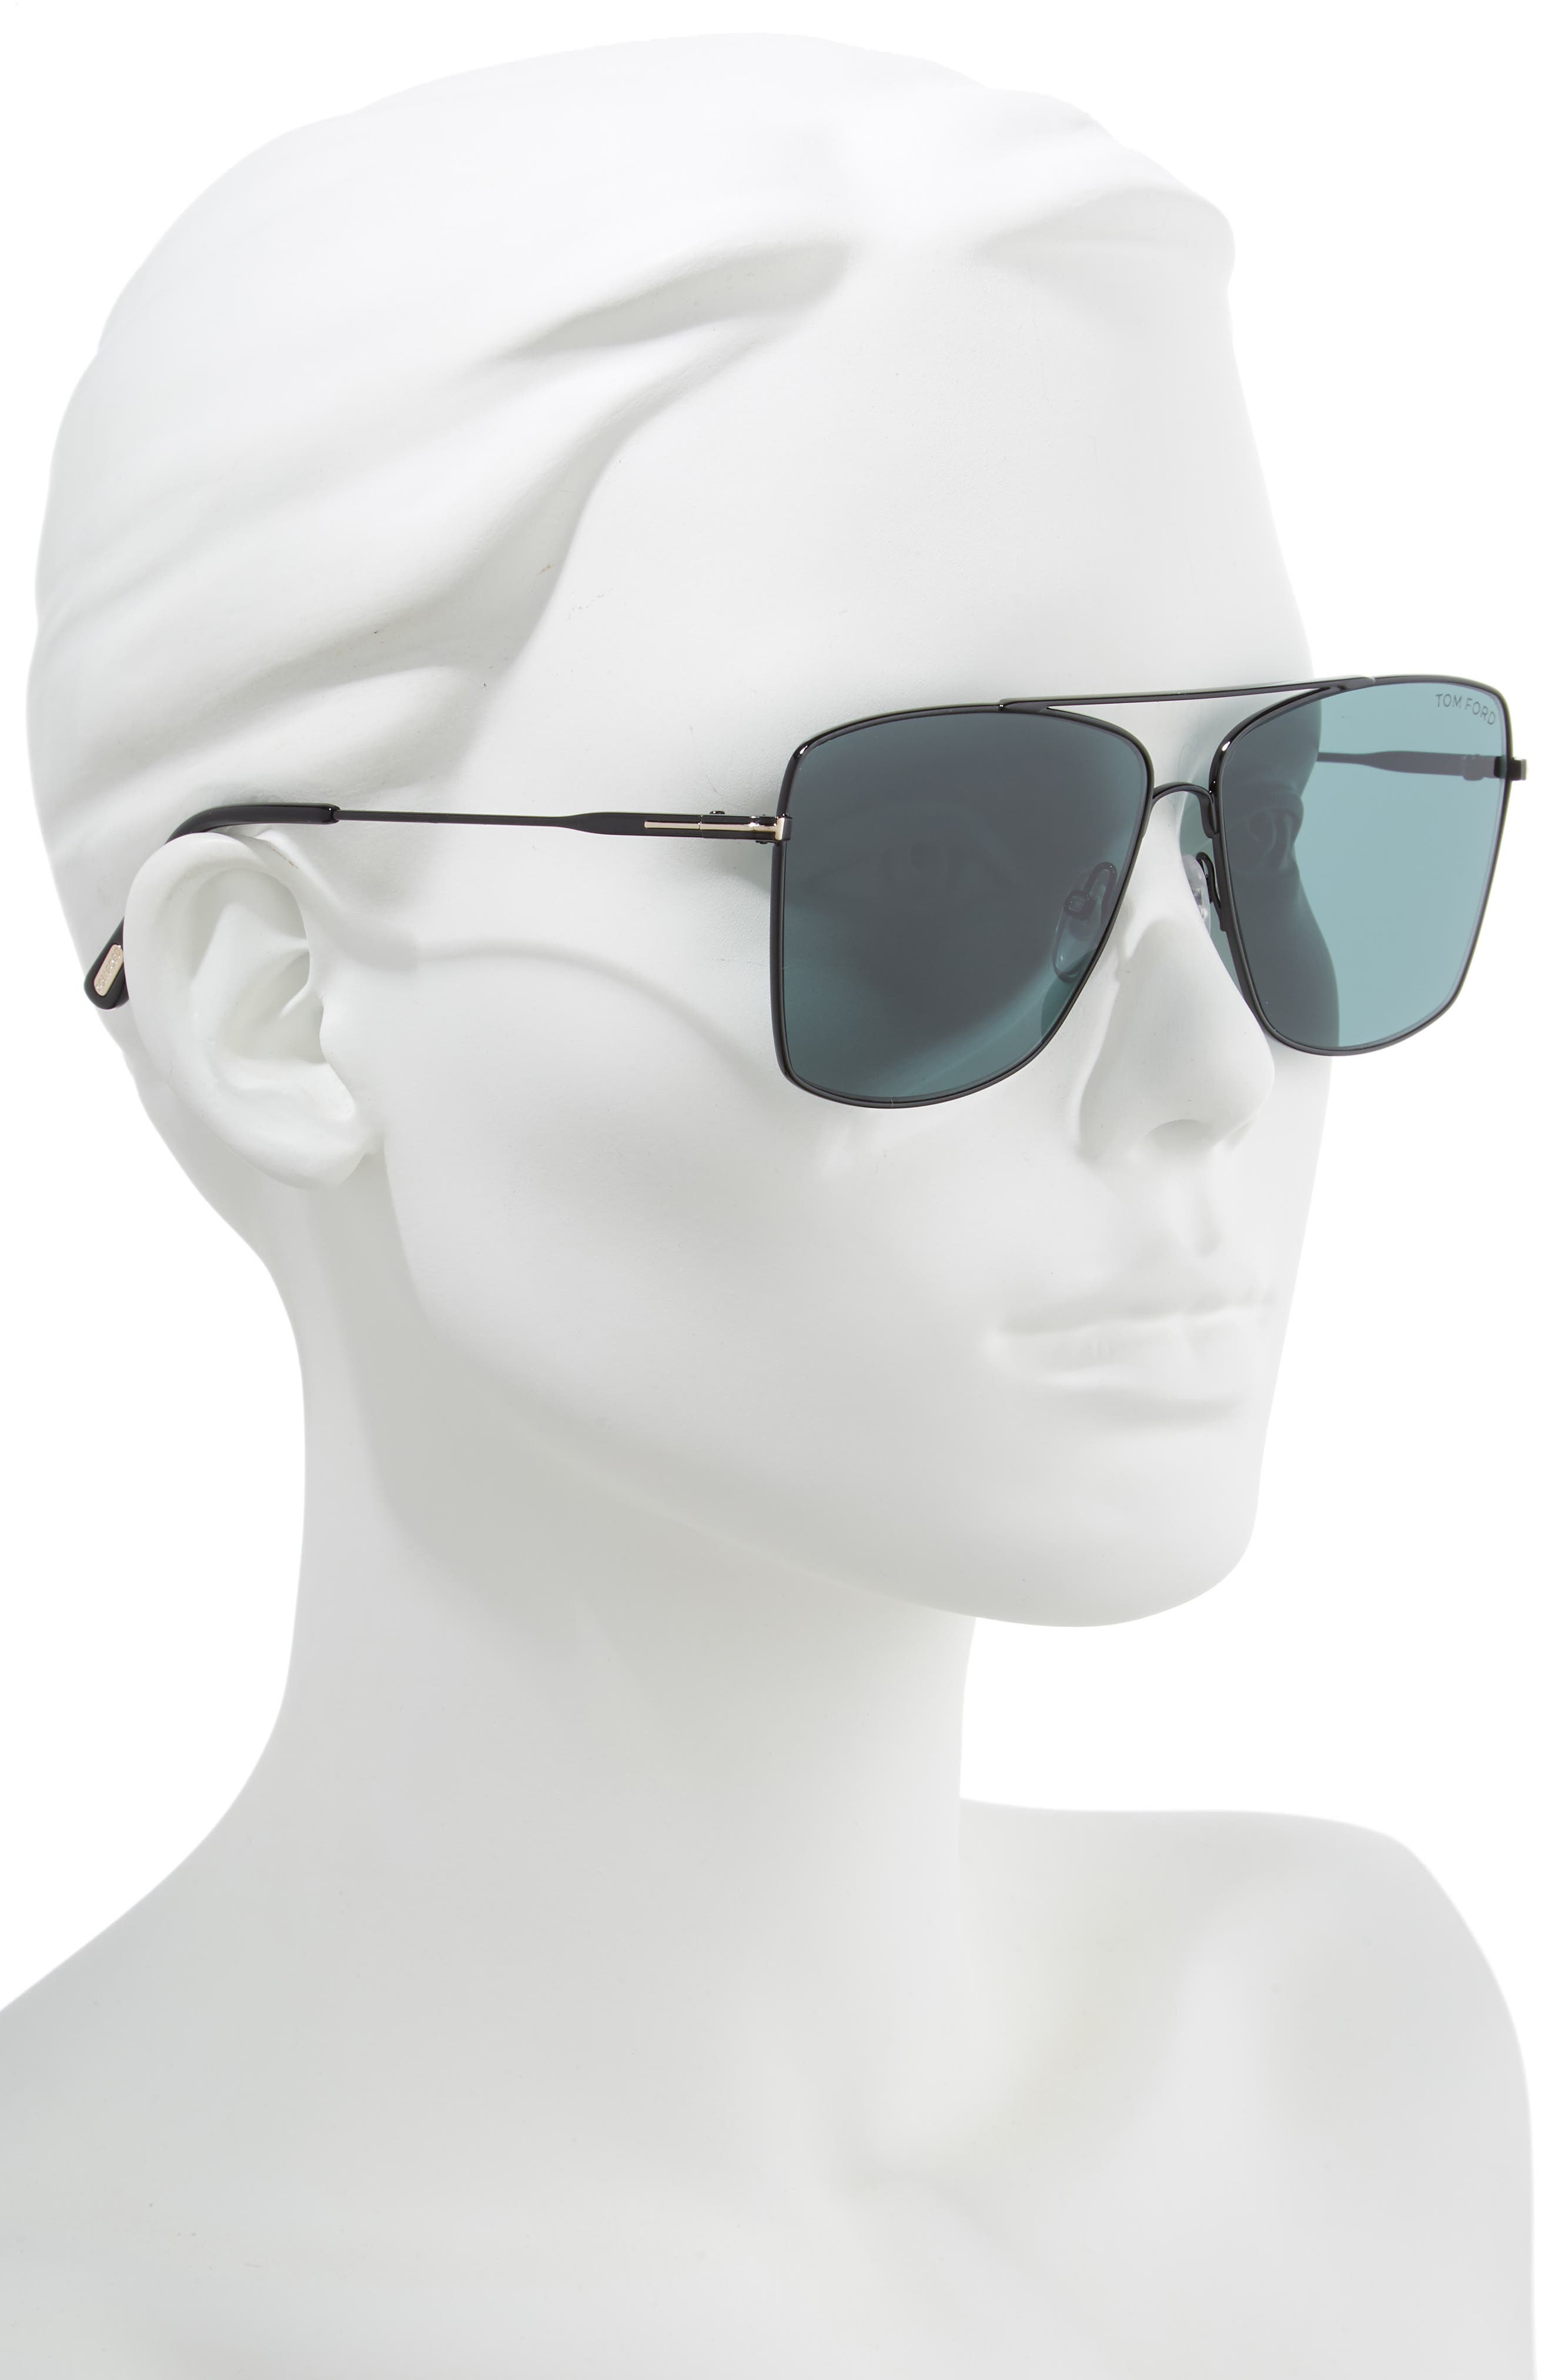 Magnus 60mm Aviator Sunglasses,                             Alternate thumbnail 2, color,                             SHINY BLACK/ DARK TEAL